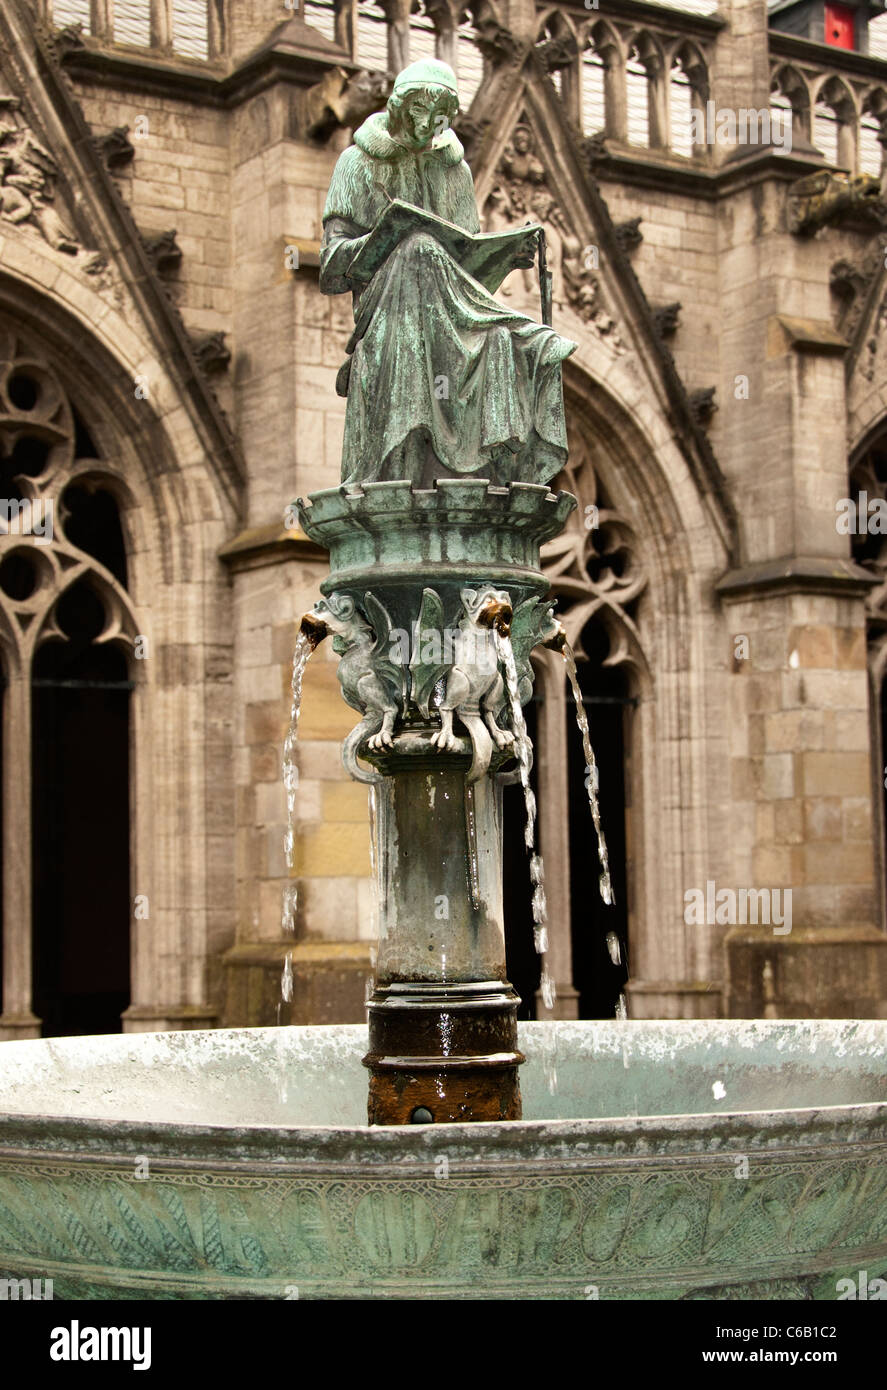 La Catedral de Saint Martin la iglesia Dom de Utrecht Países Bajos Imagen De Stock